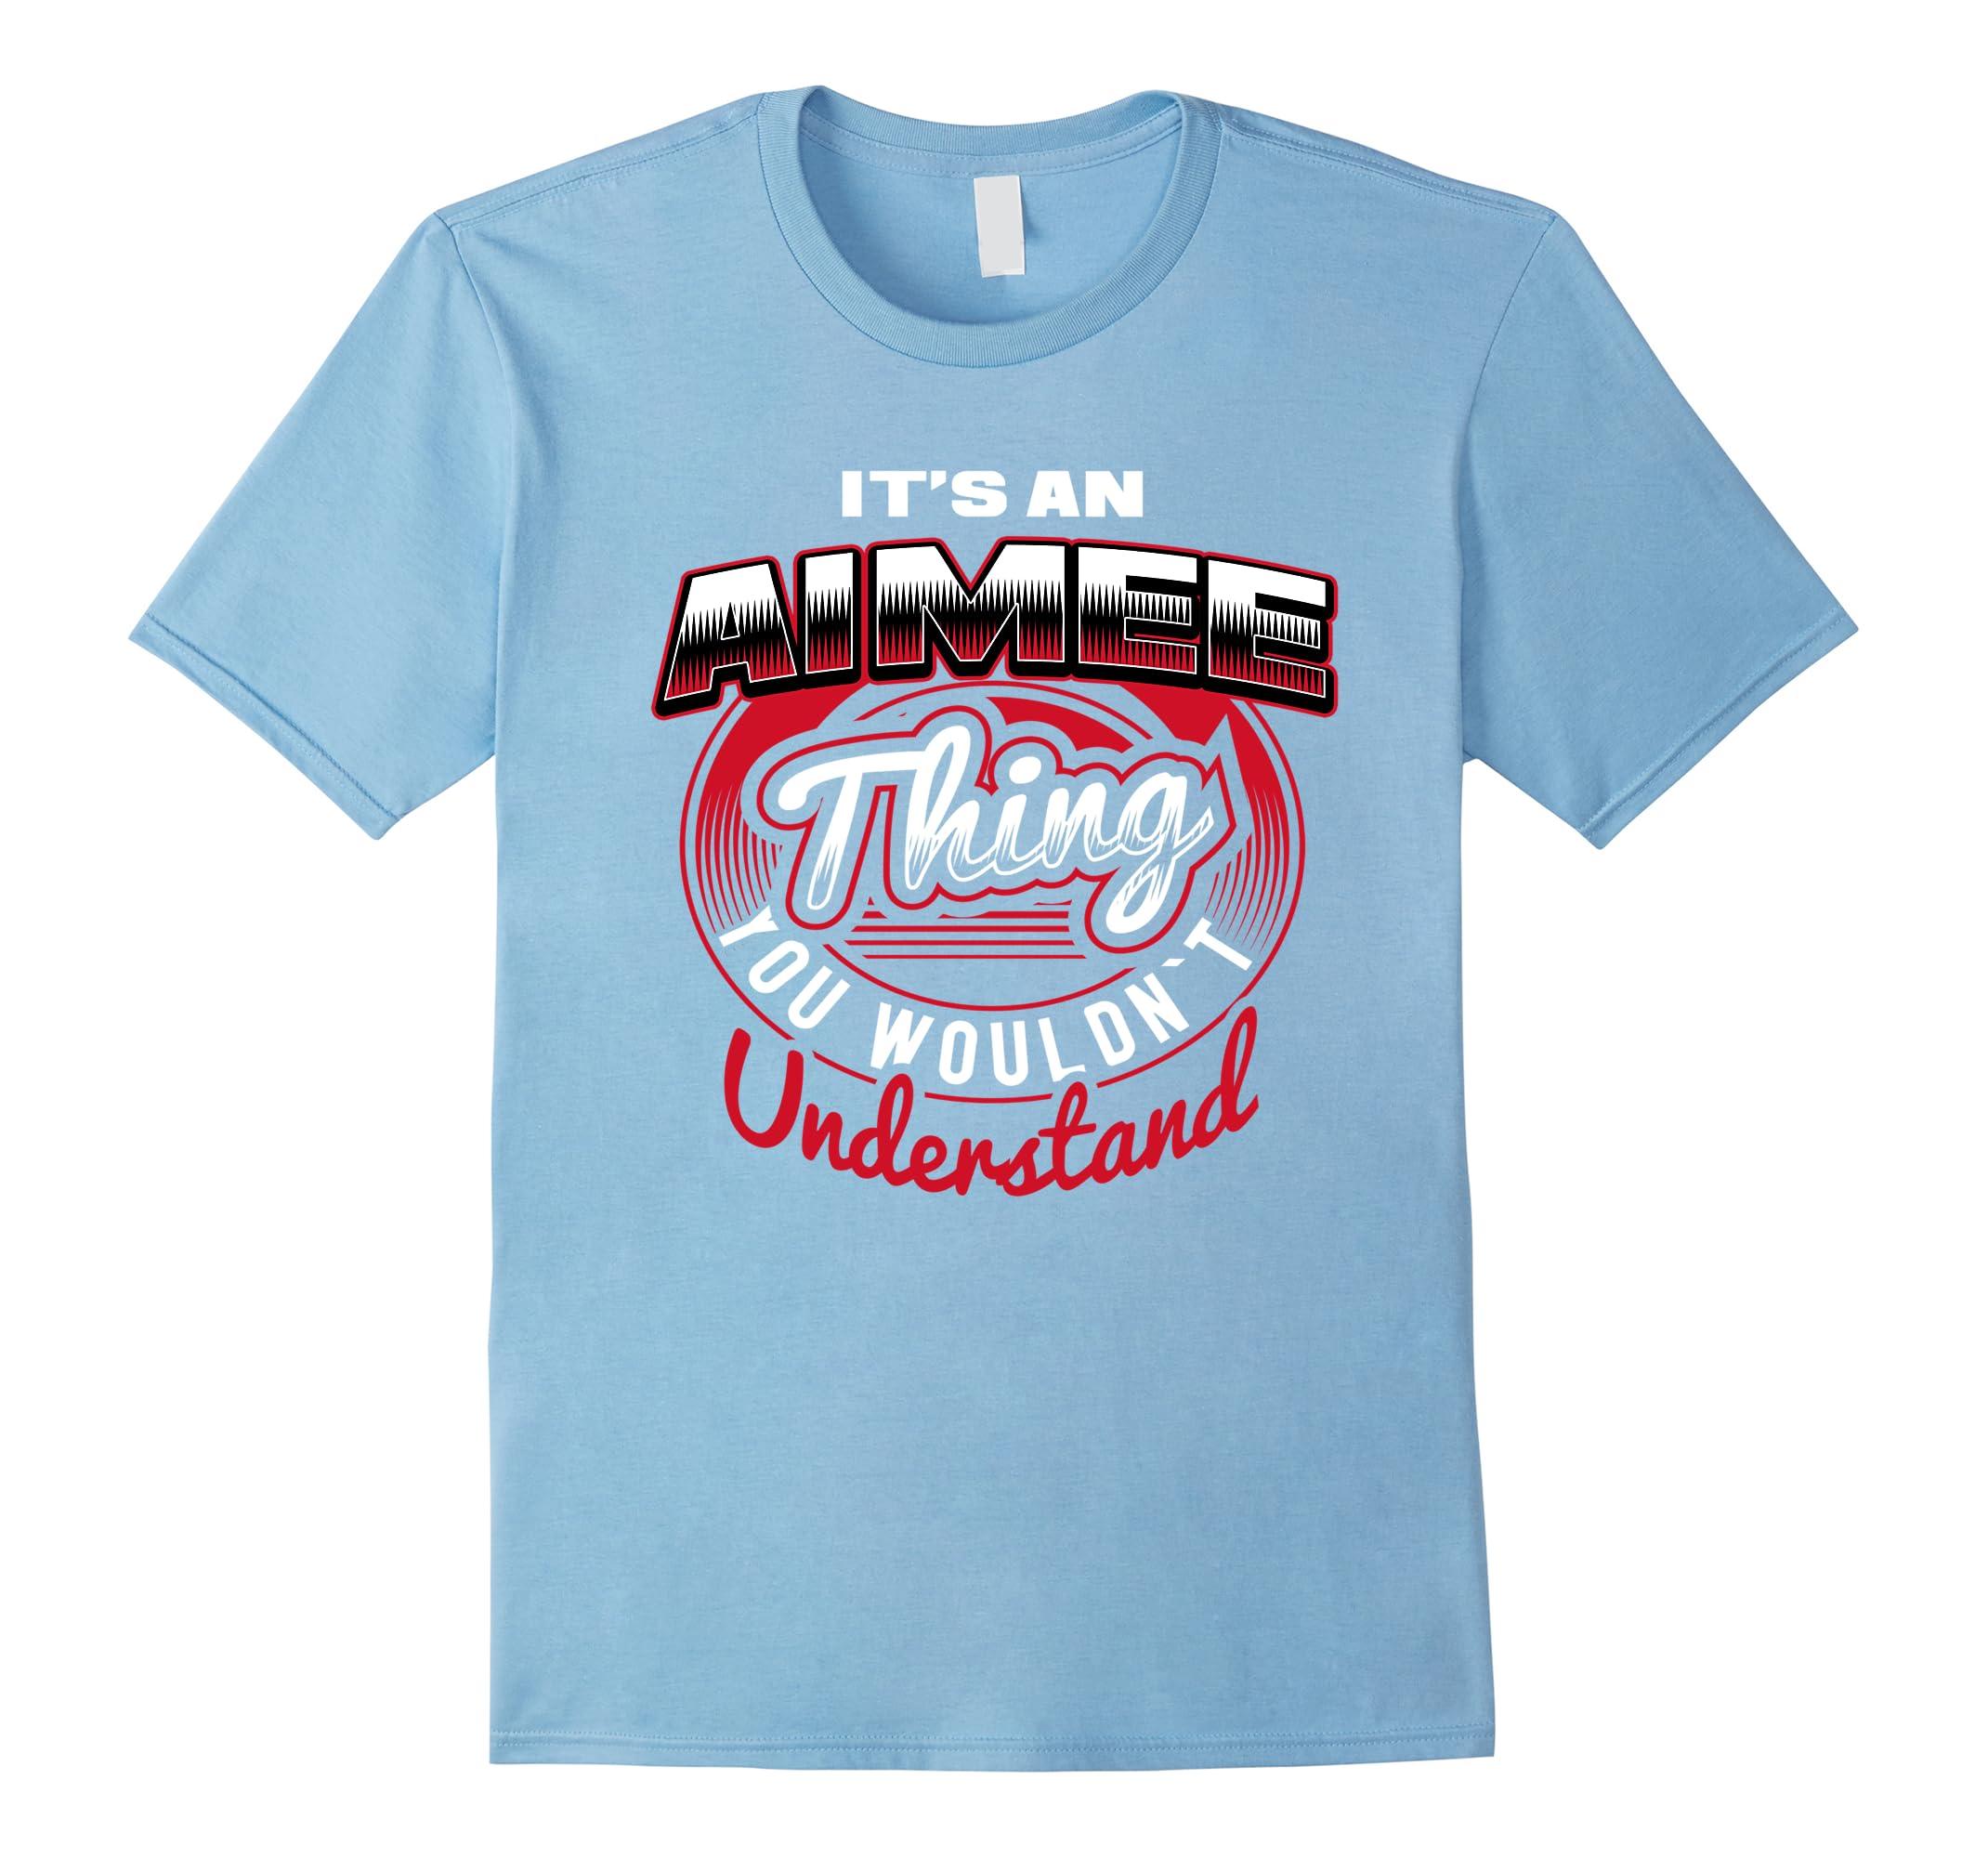 AIMEE Name T-Shirts: It's An AIMEE Thing-RT